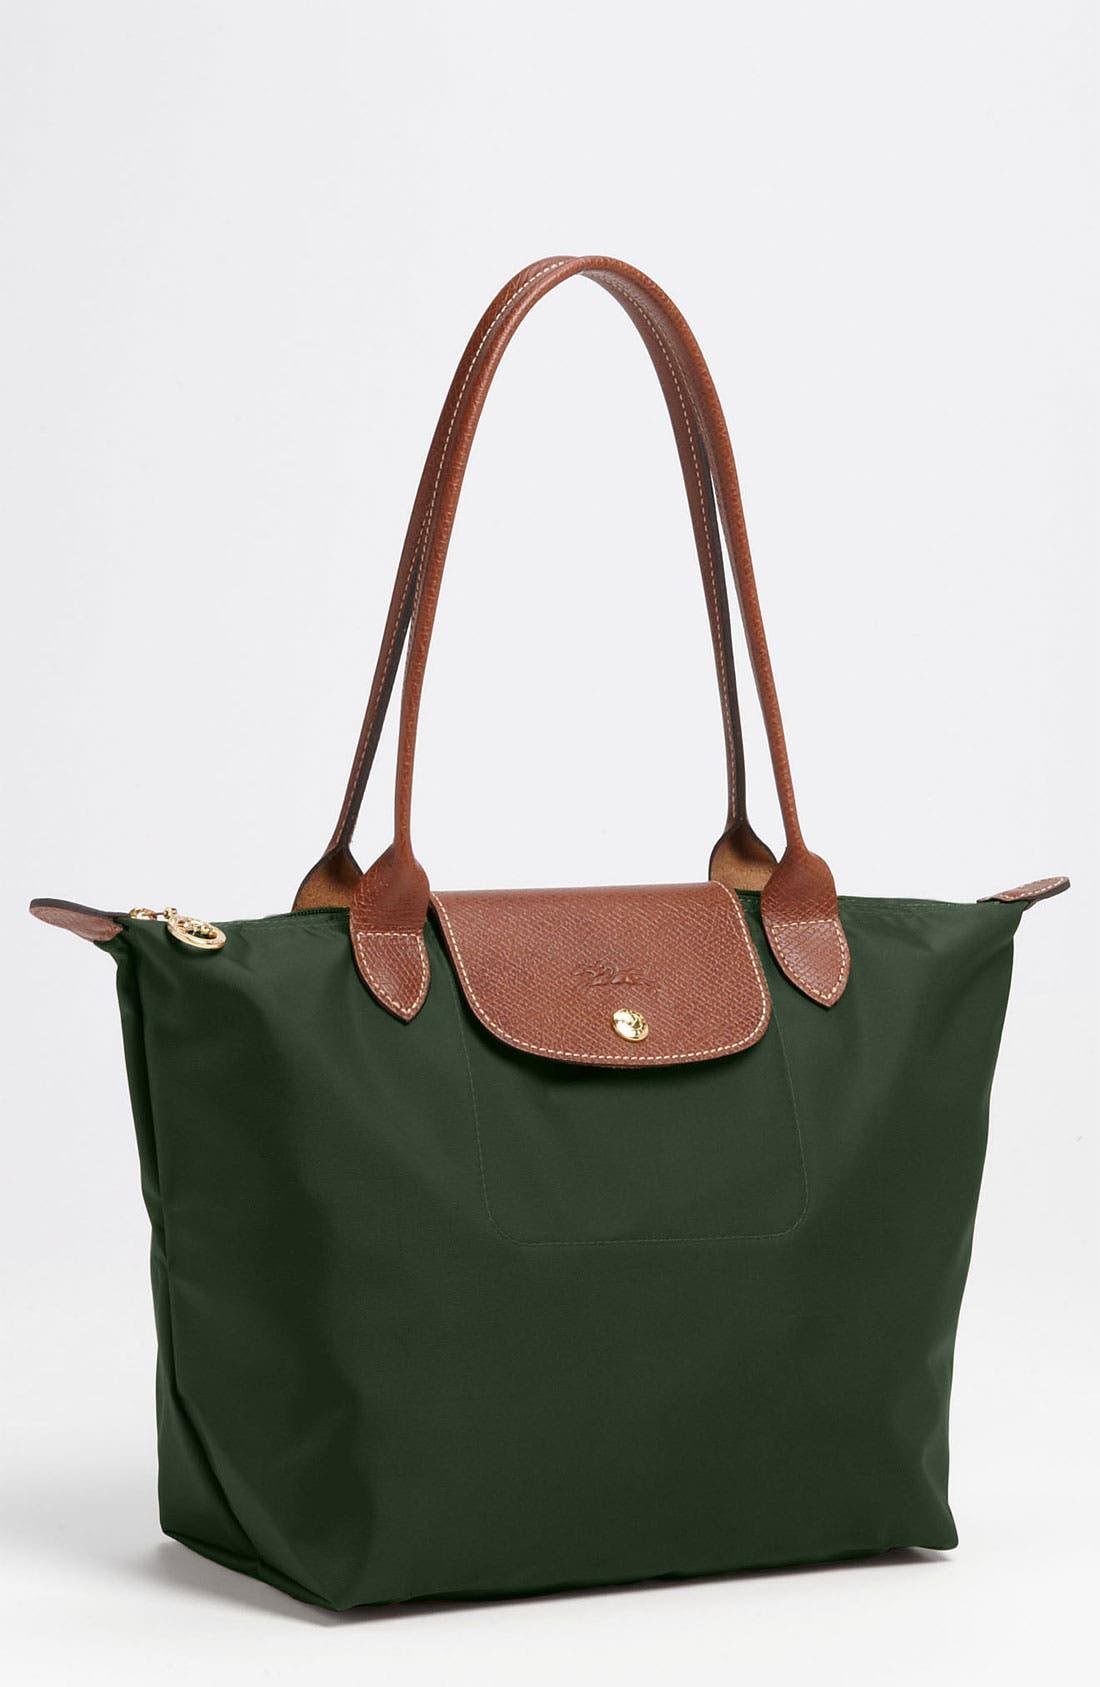 Main Image - Longchamp 'Le Pliage - Small Shopping Bag'